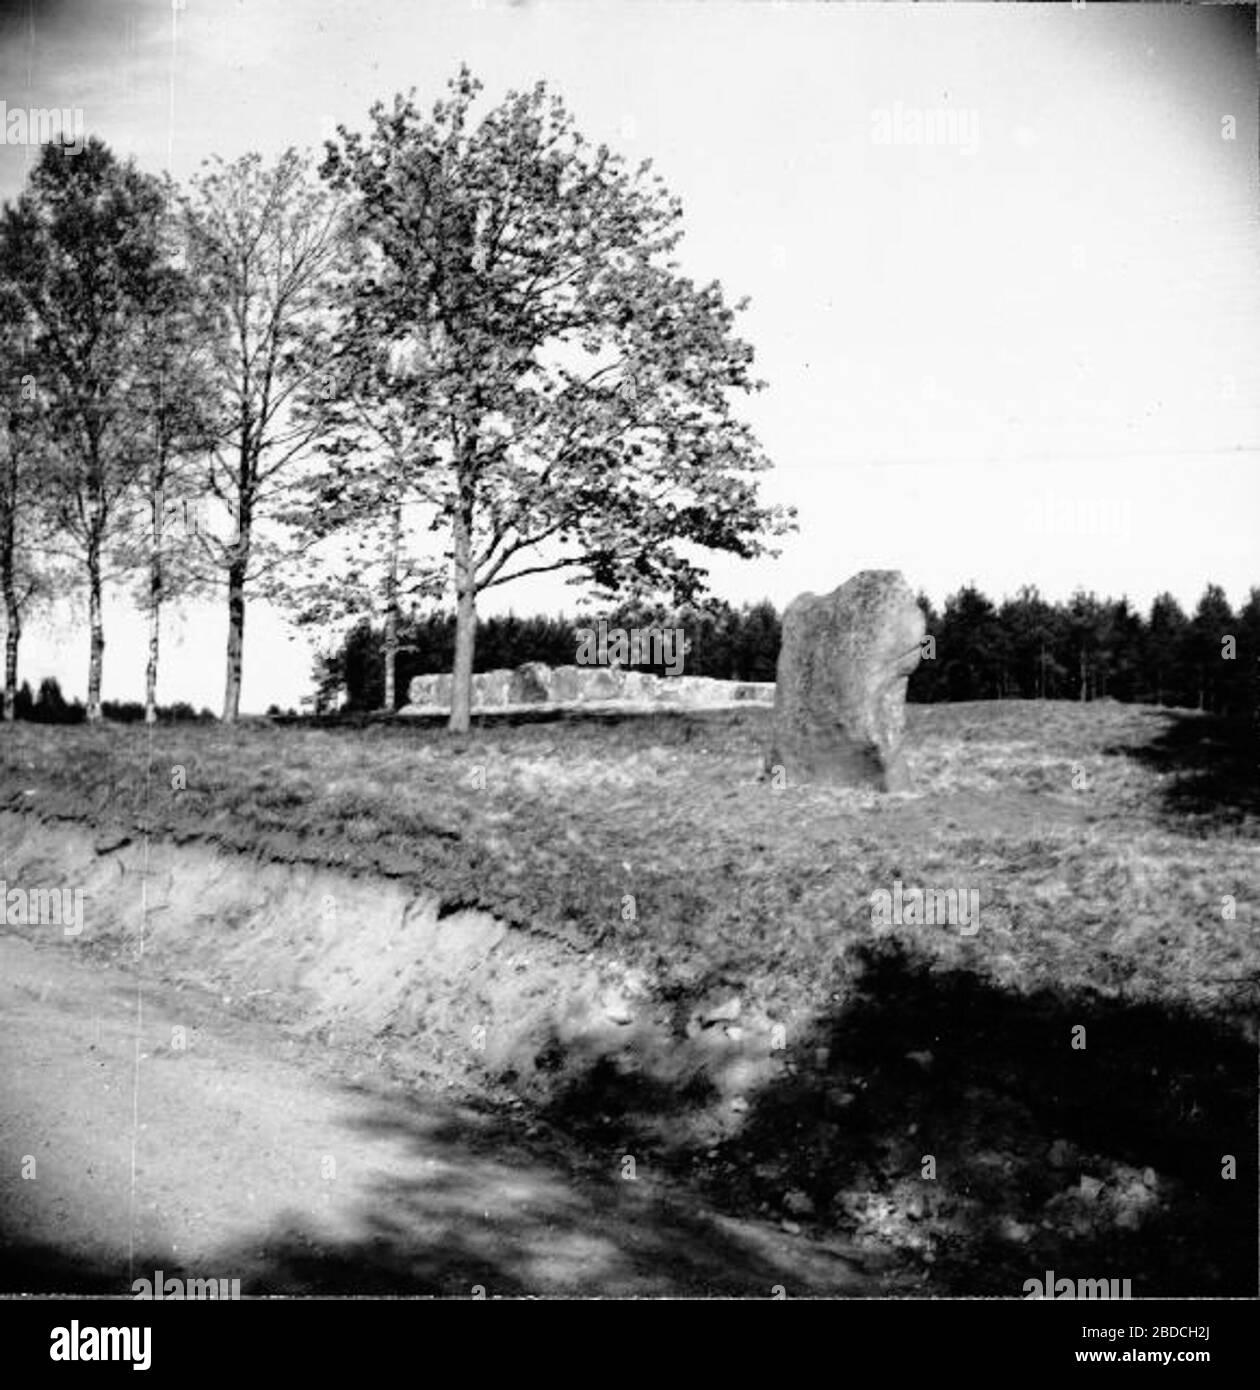 Brita Wallbom (1754 - 1827) - Genealogy - Geni